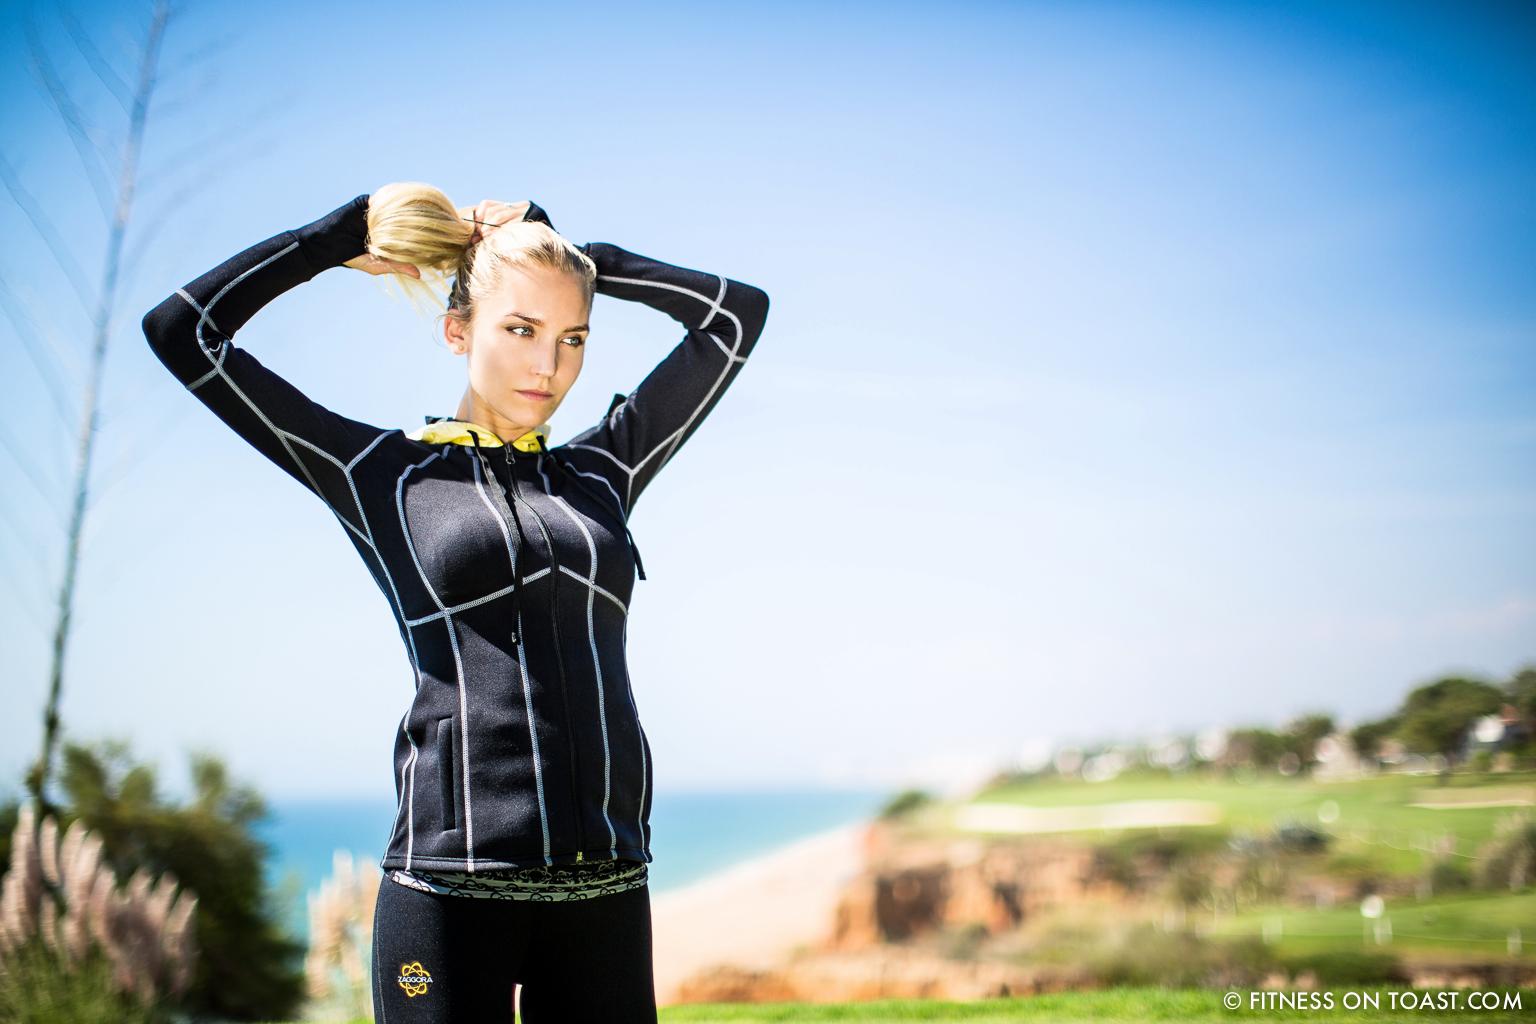 Portugal Algarve Zaggora Running Sports Fitness Girl Faya Fitness On Toast Run Val De Lobo Royal Golf Course Blog-4